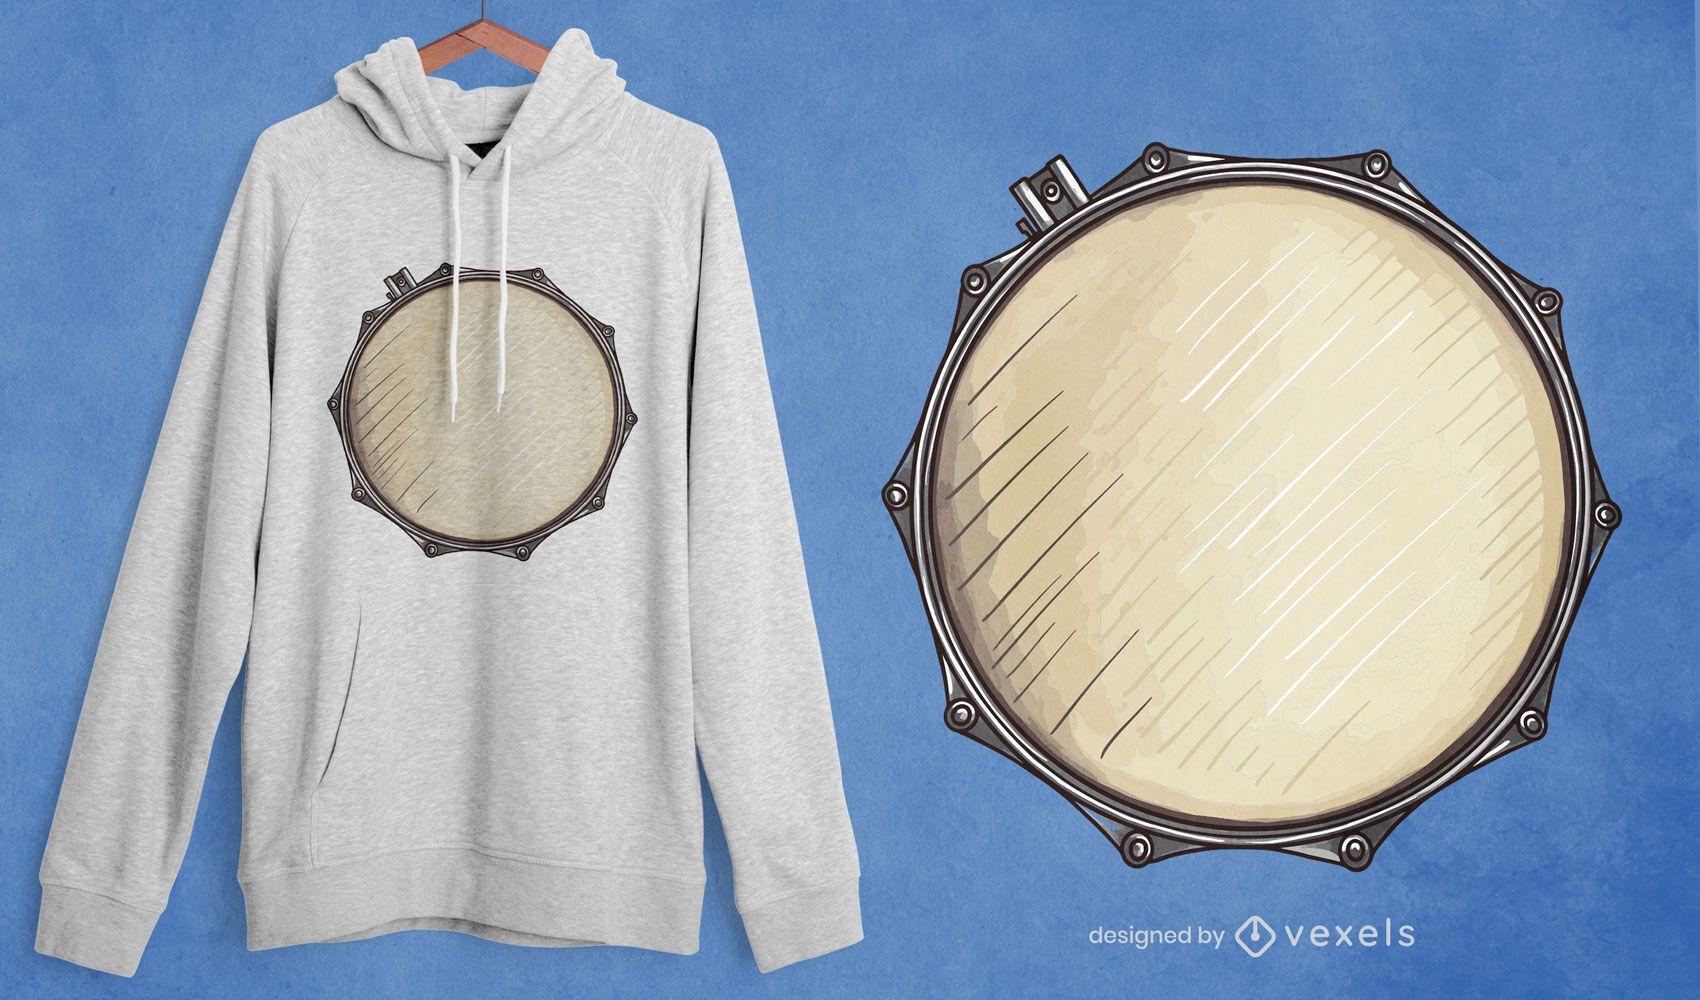 Snare drum t-shirt design